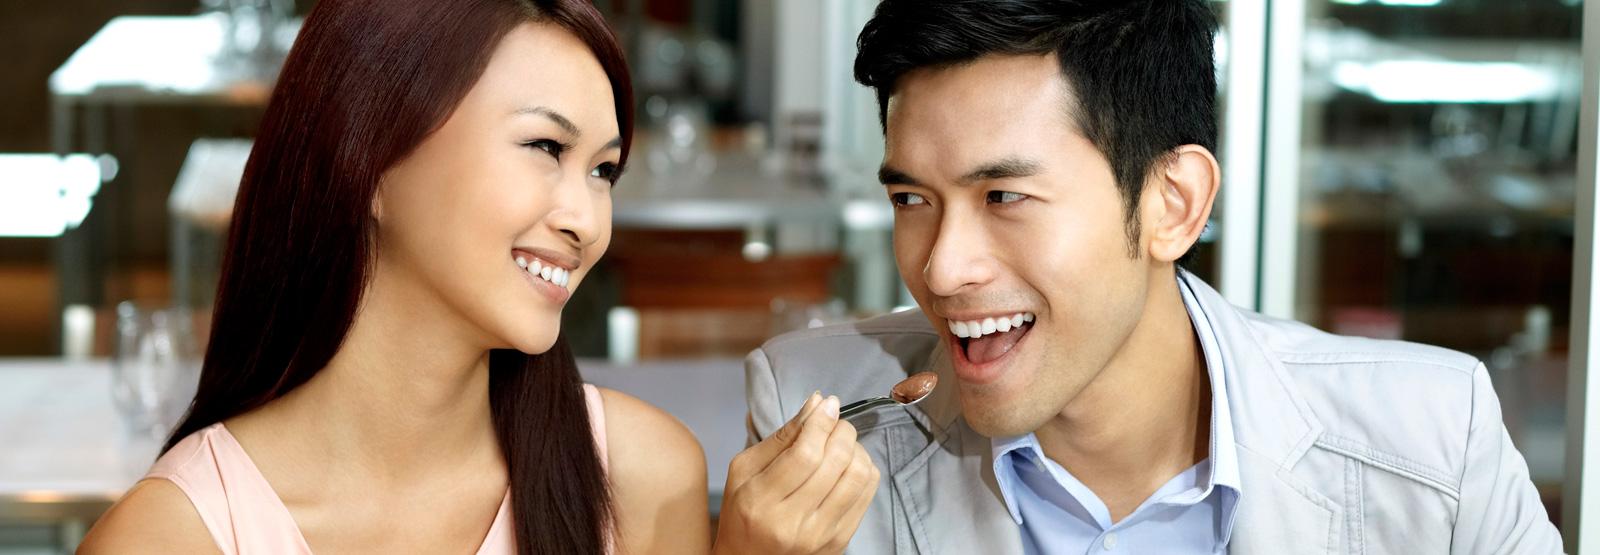 Romantic Getaway in KL   Romance Offers at Berjaya Times Square Hotel